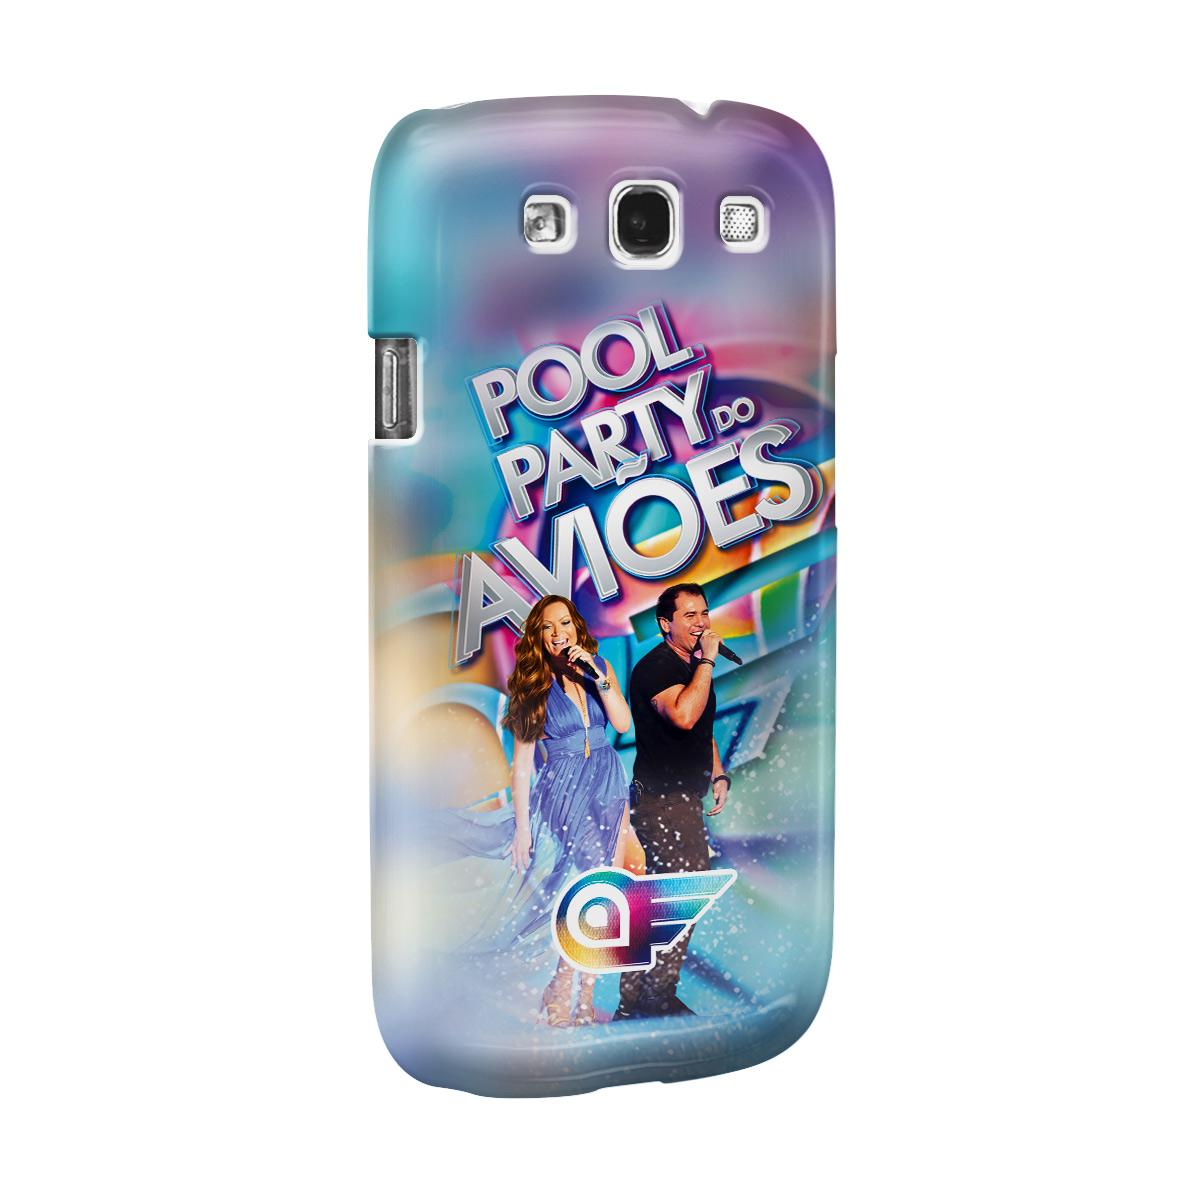 Capa de Celular Samsung Galaxy S3 Aviões do Forró Capa Pool Party